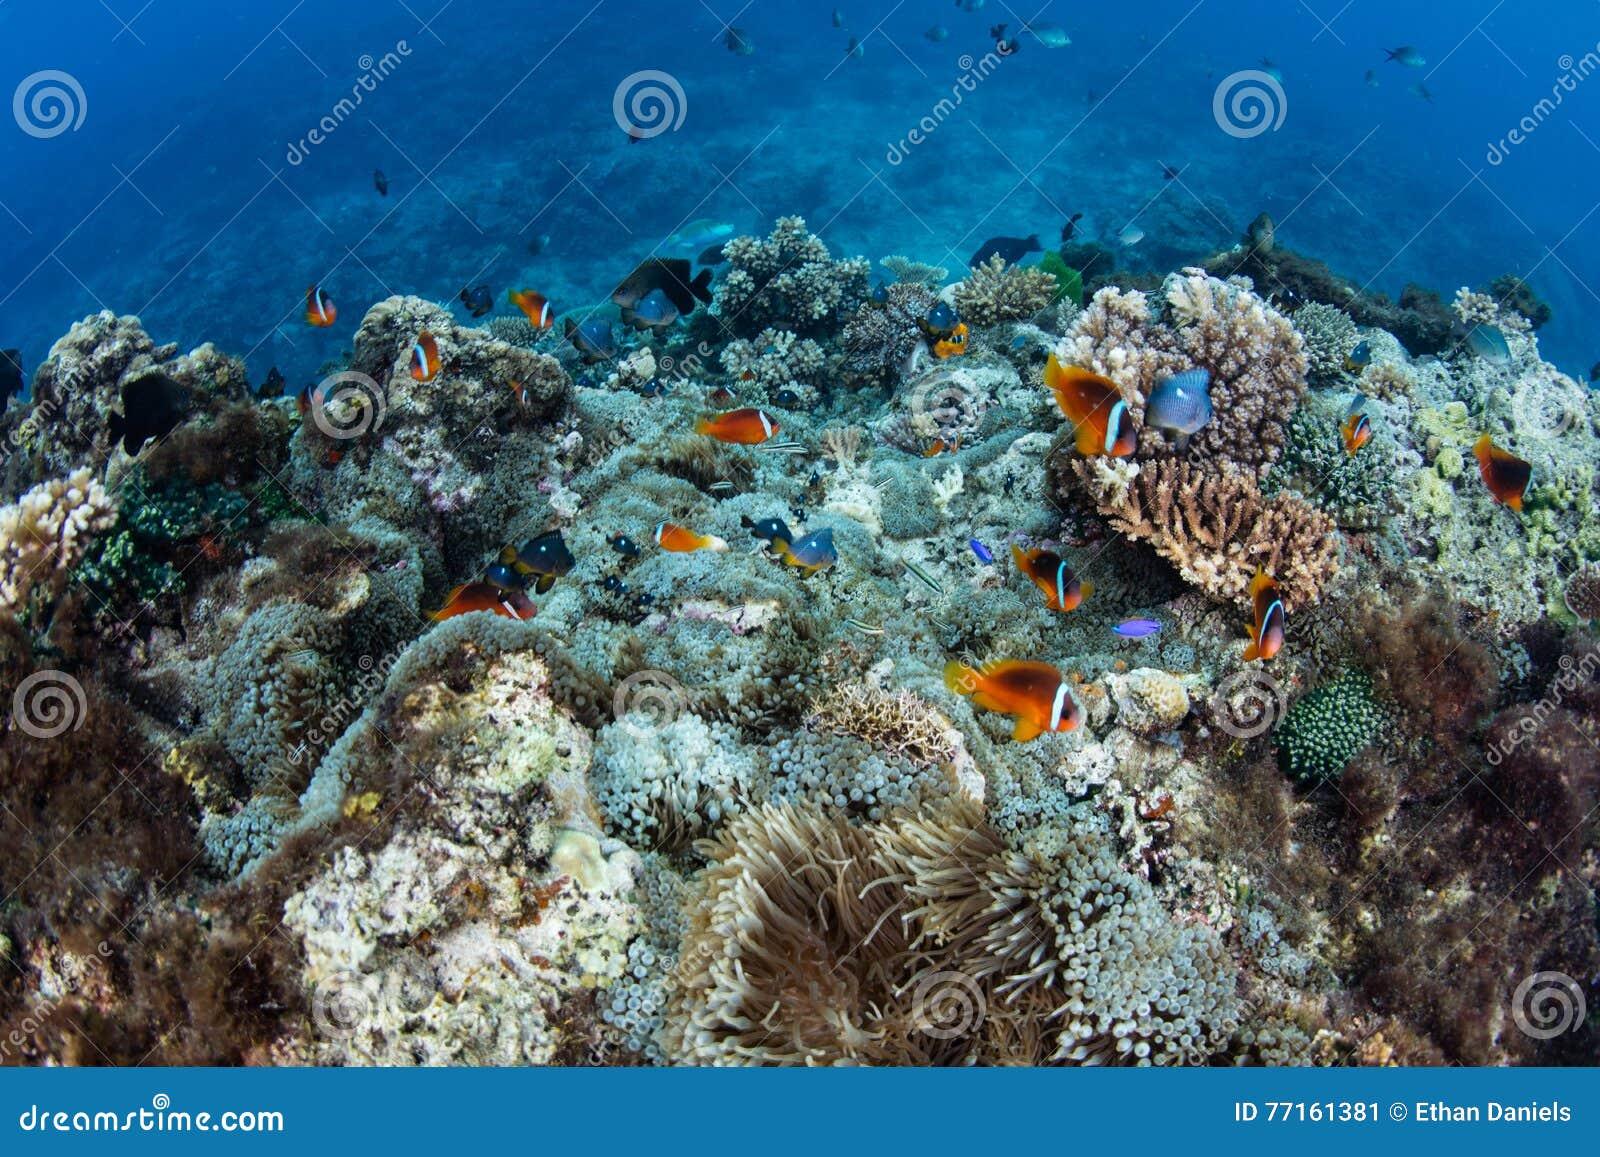 Les Fidji Anemonefish et Coral Reef